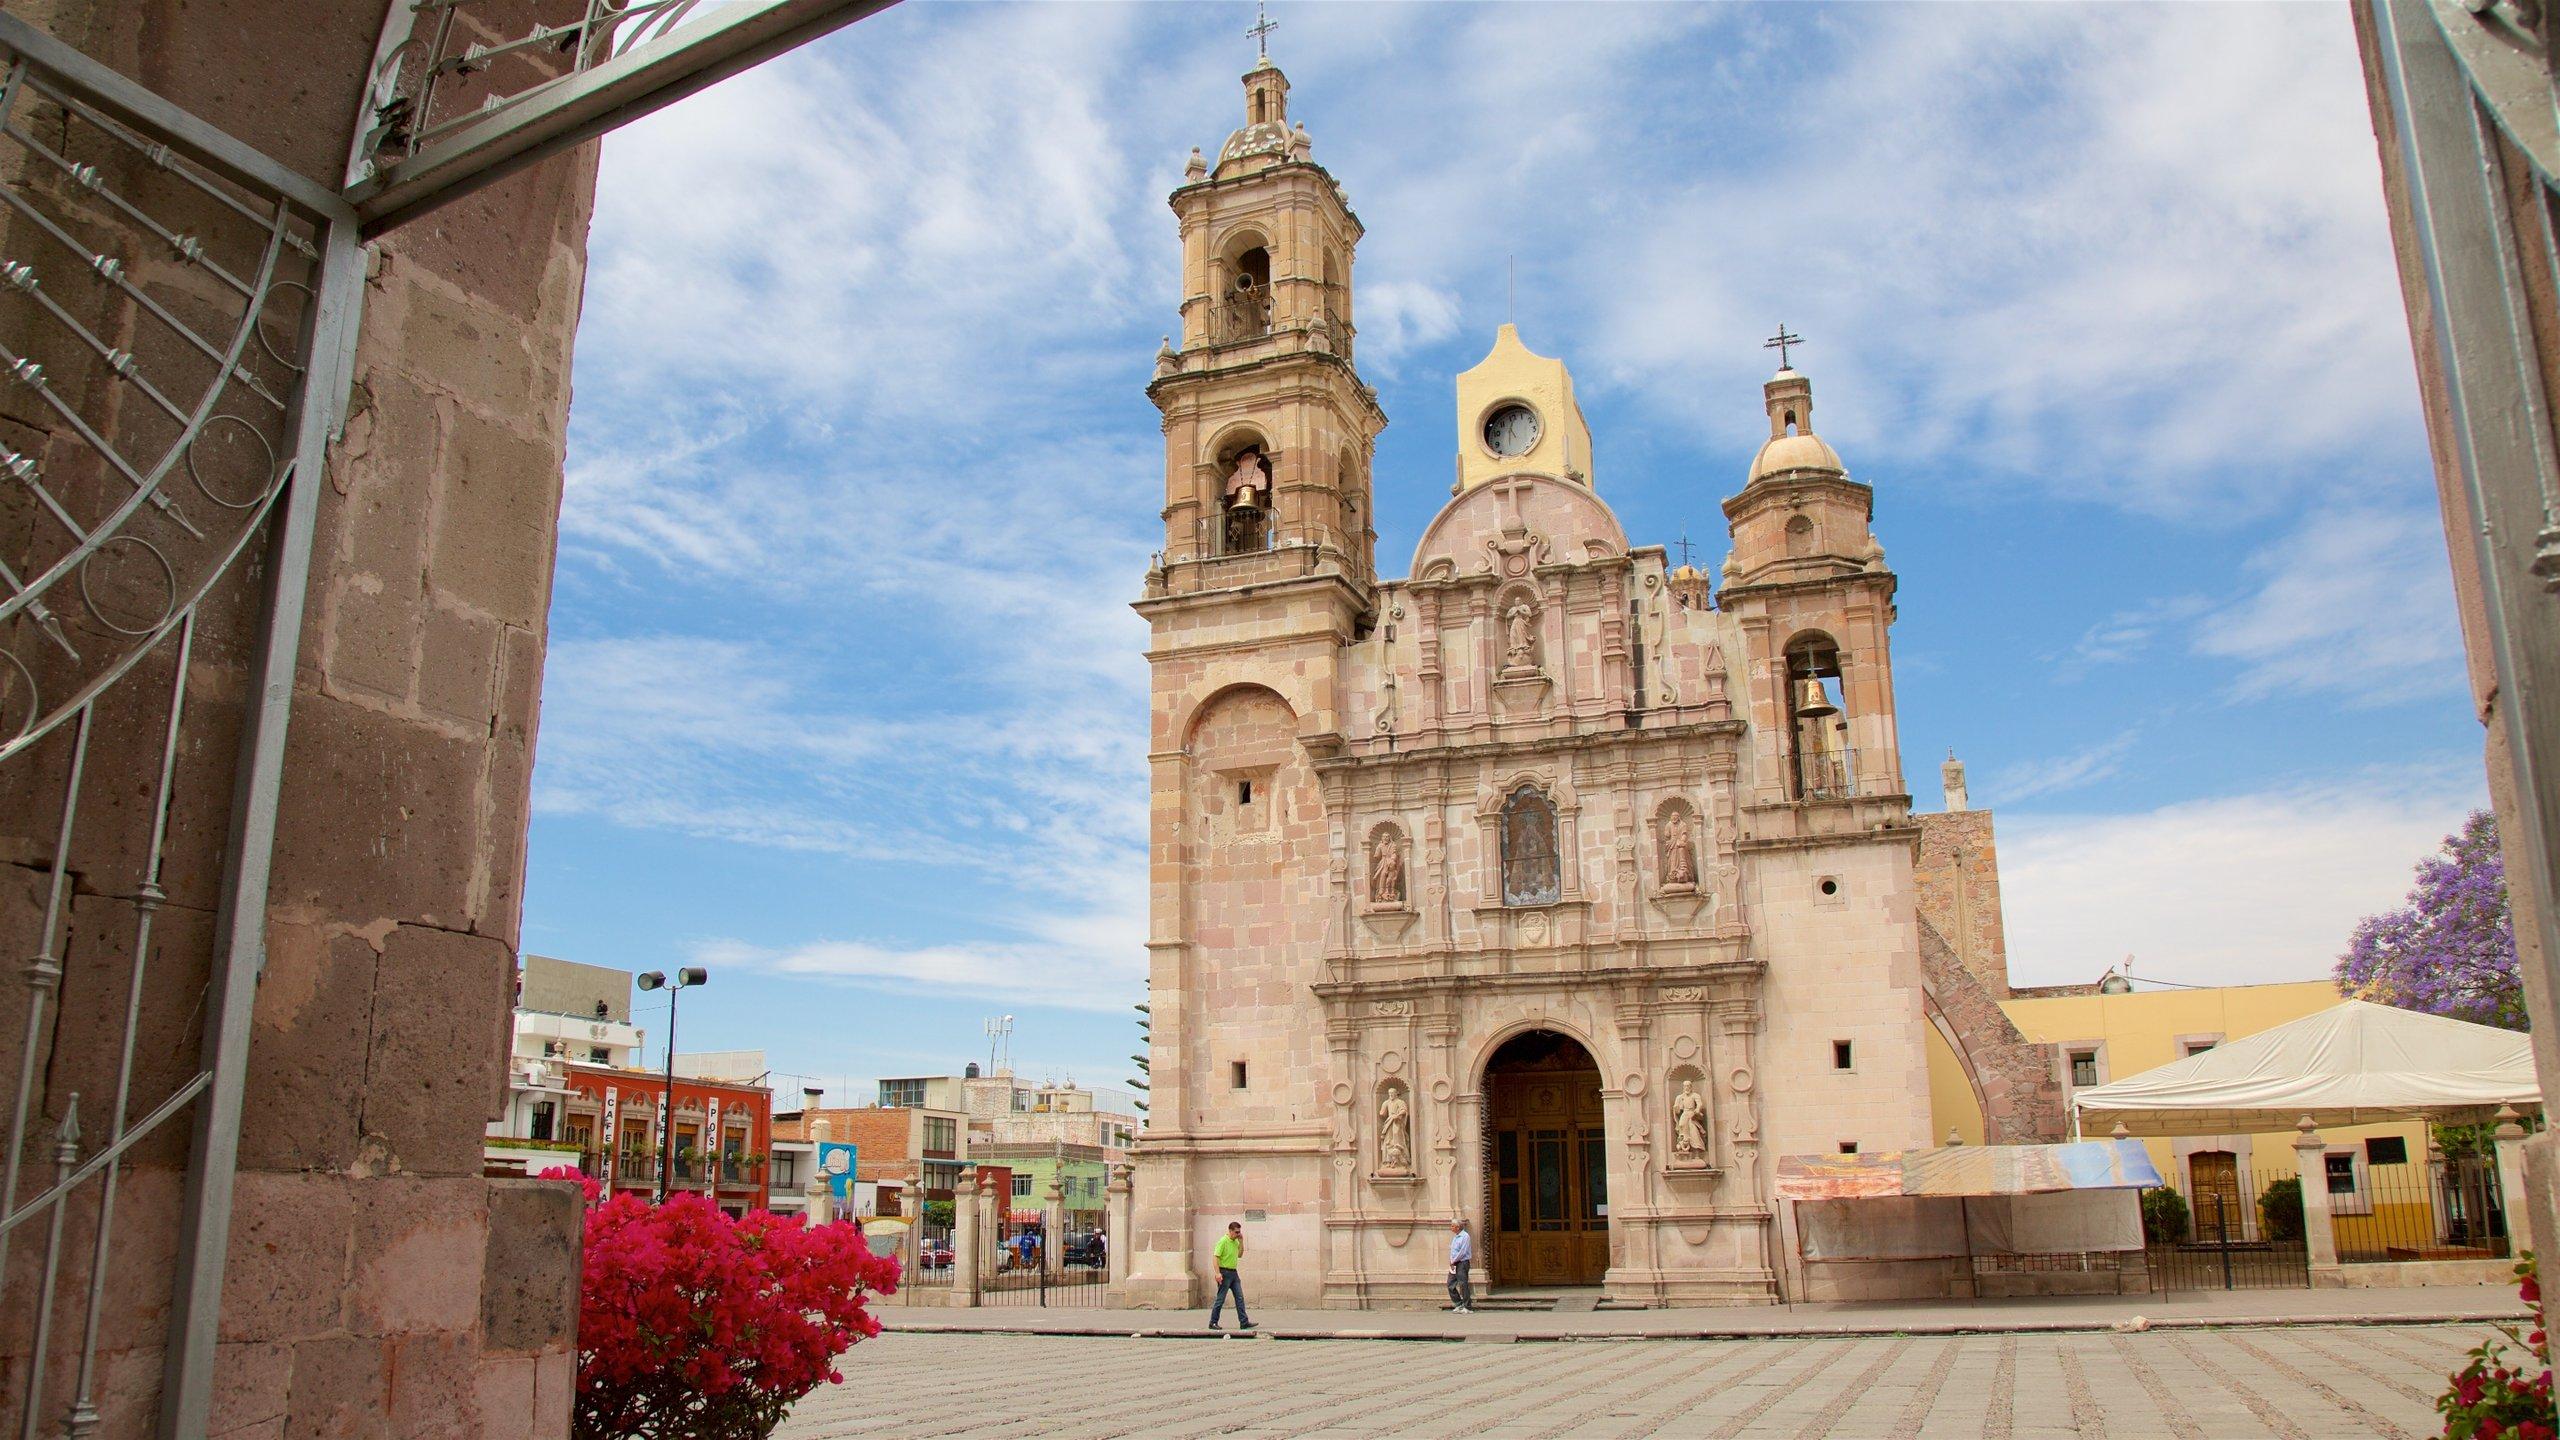 Top 10 Pet Friendly Hotels In Aguascalientes $20: Dog & Cat Friendly ...